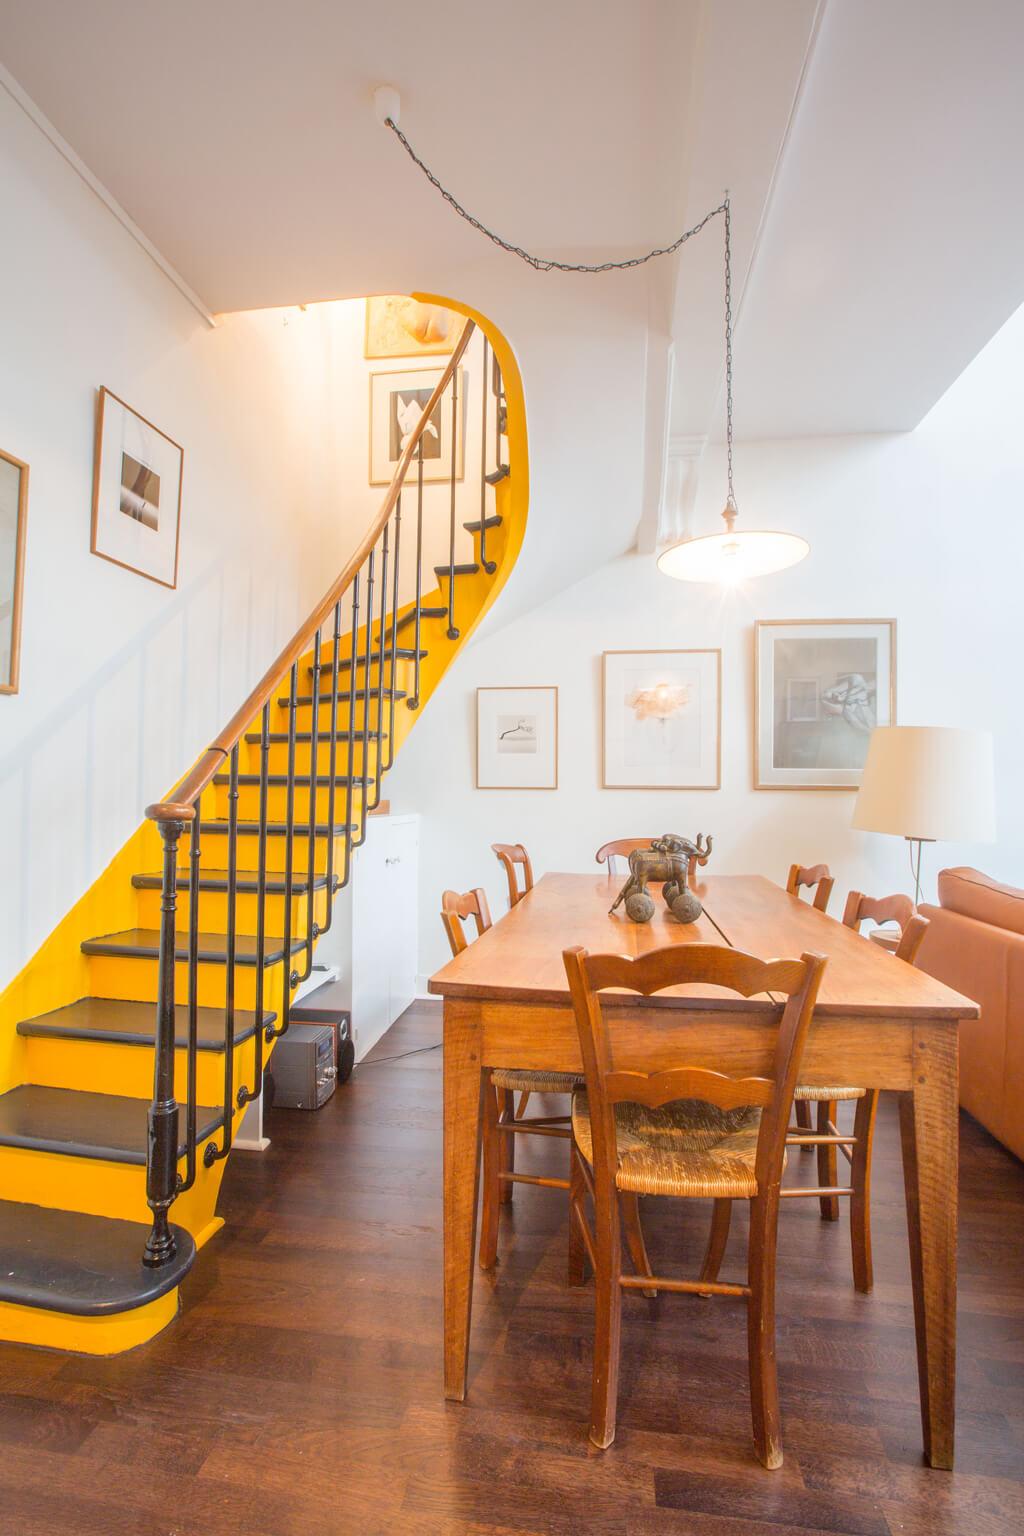 paris vacation apartment rental | eiffel tower loft | haven in